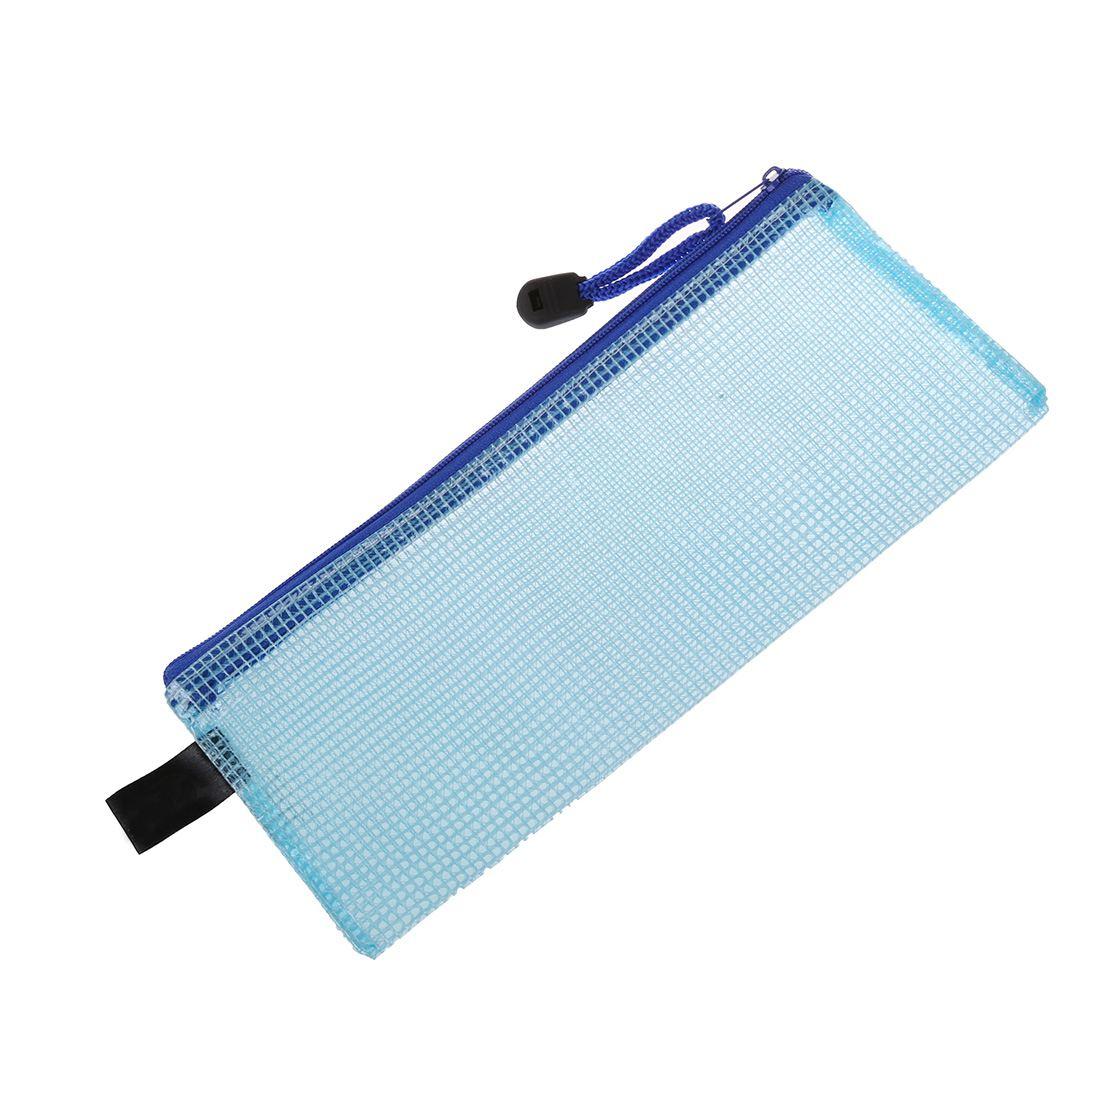 Sac a papier bleu en pvc avec fermeture a glissiere b8m3 for Fermeture pvc